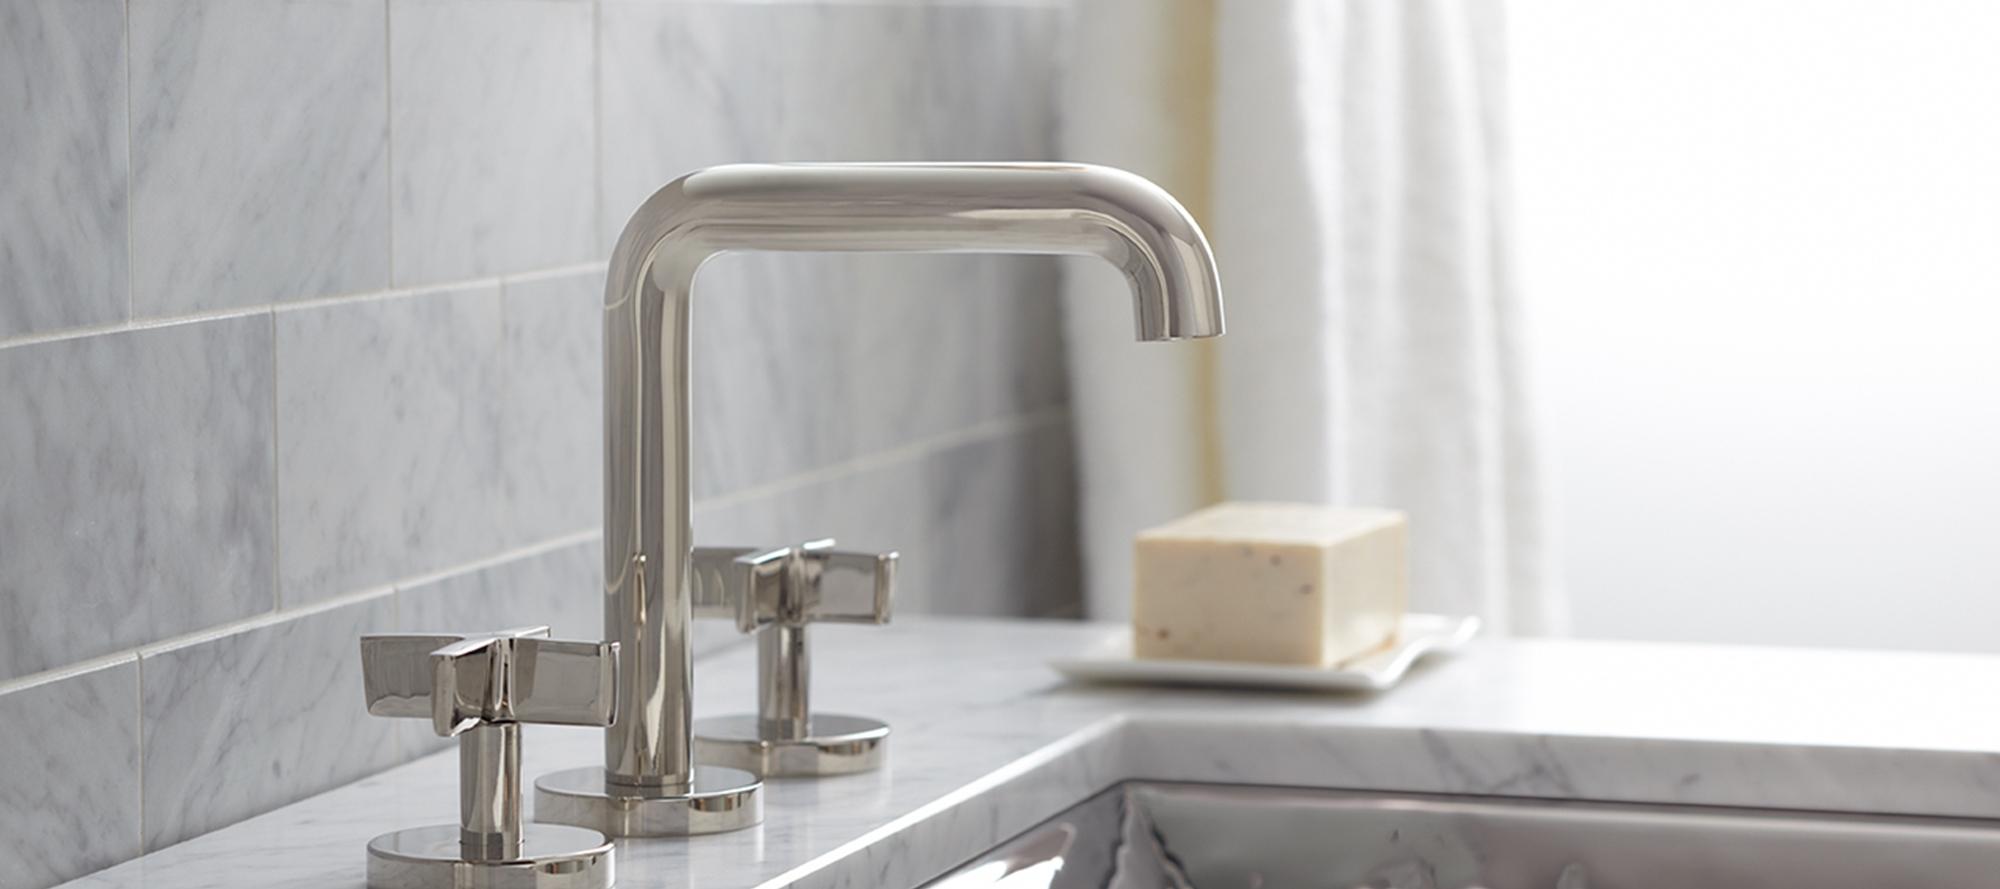 Ideas, one sink faucet low spout cross handles p24491 cr faucets pertaining to measurements 2000 x 889  .